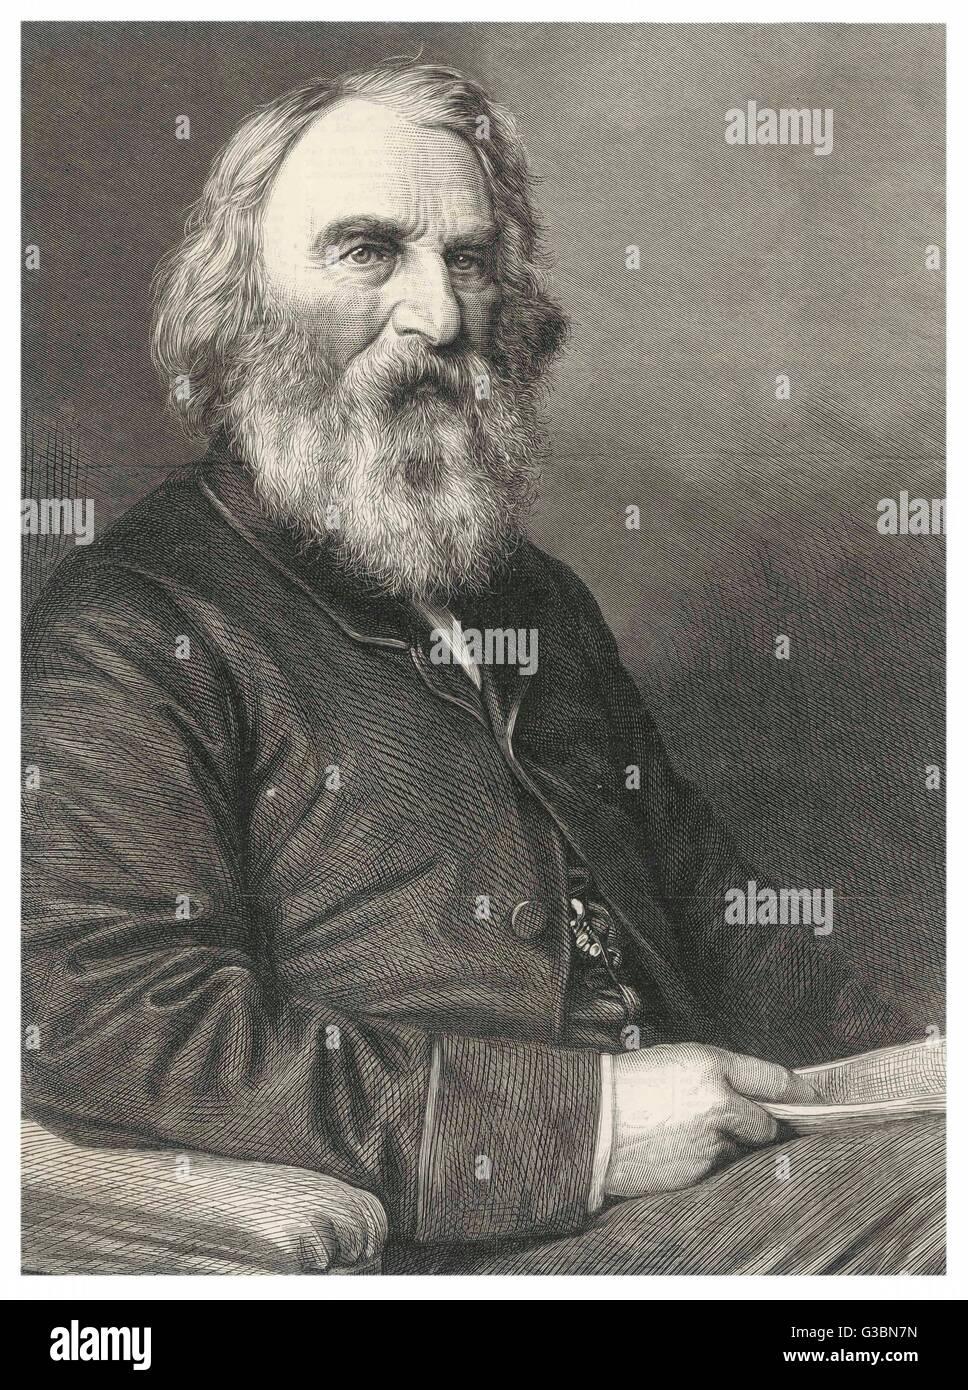 Henry Longfellow: Biography and Creativity